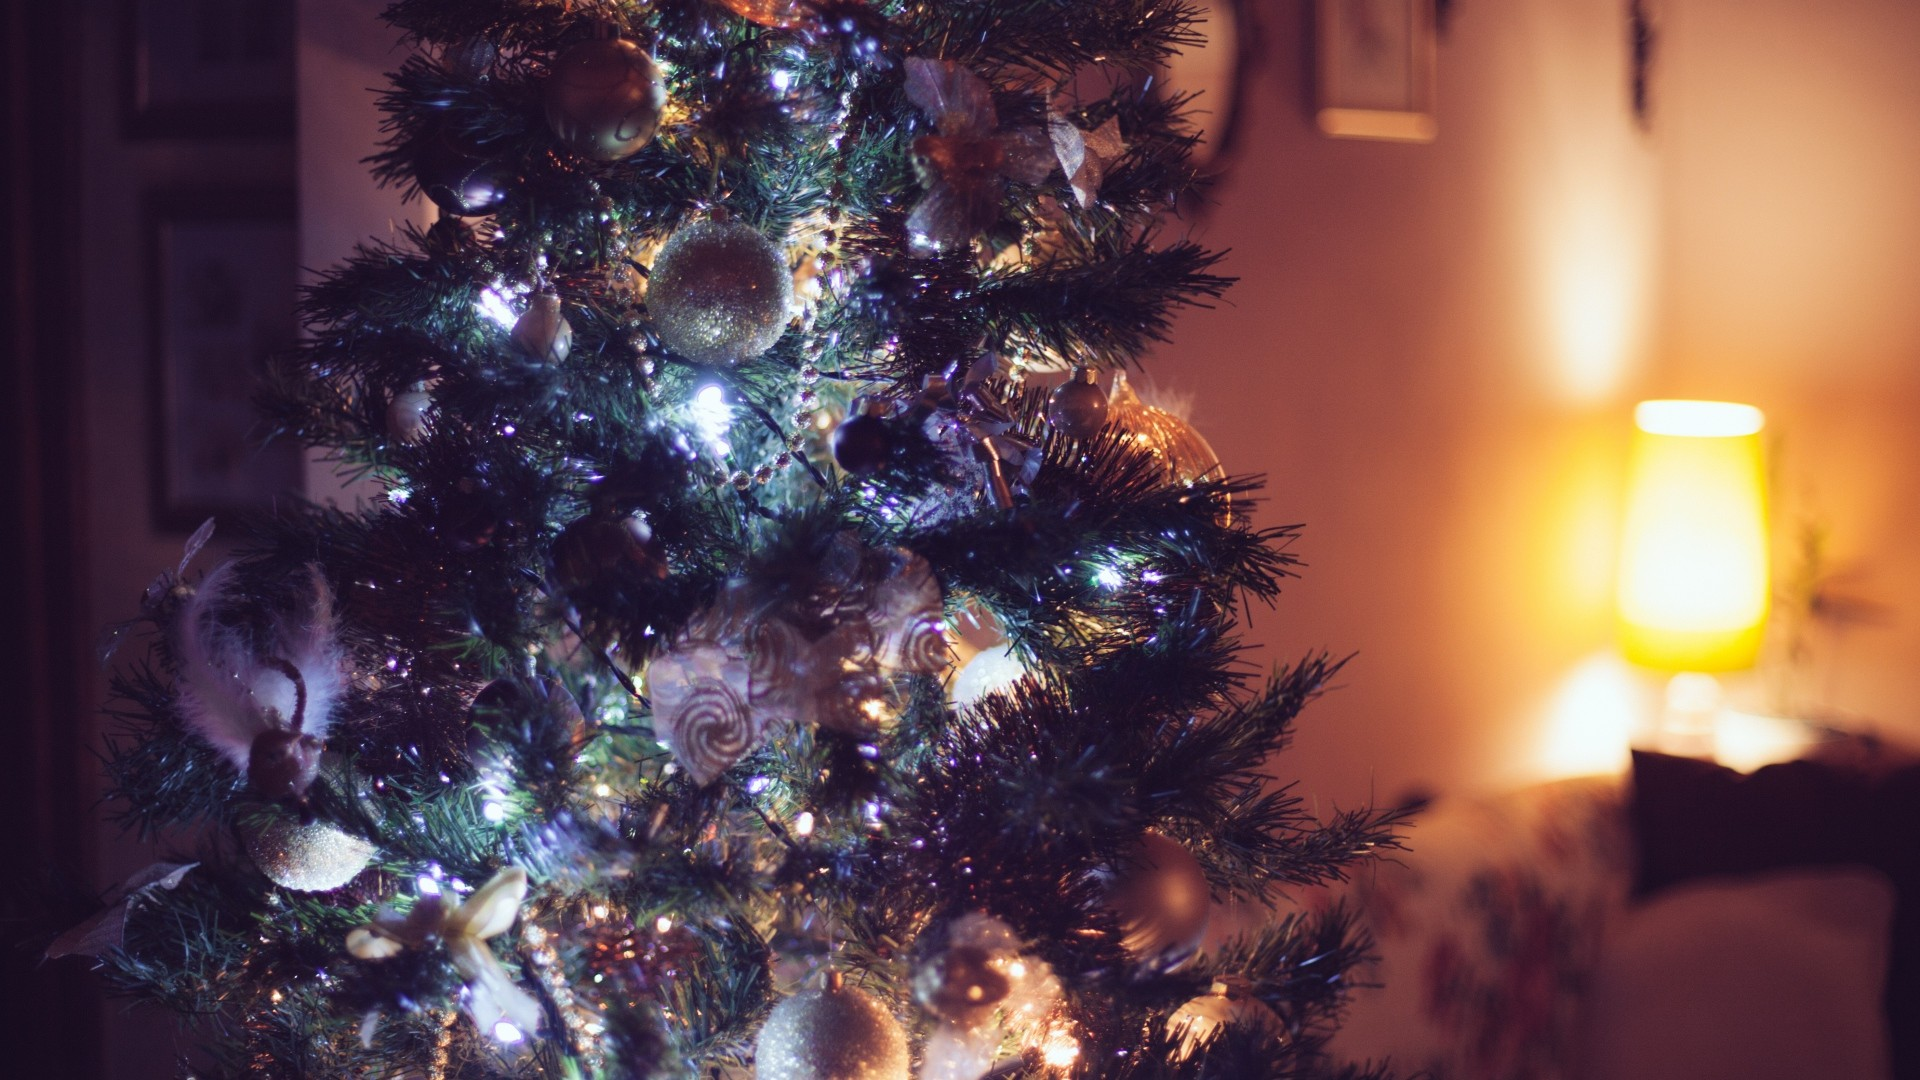 christmas hd wallpaper 1080p 1920x1080 (72+ images)